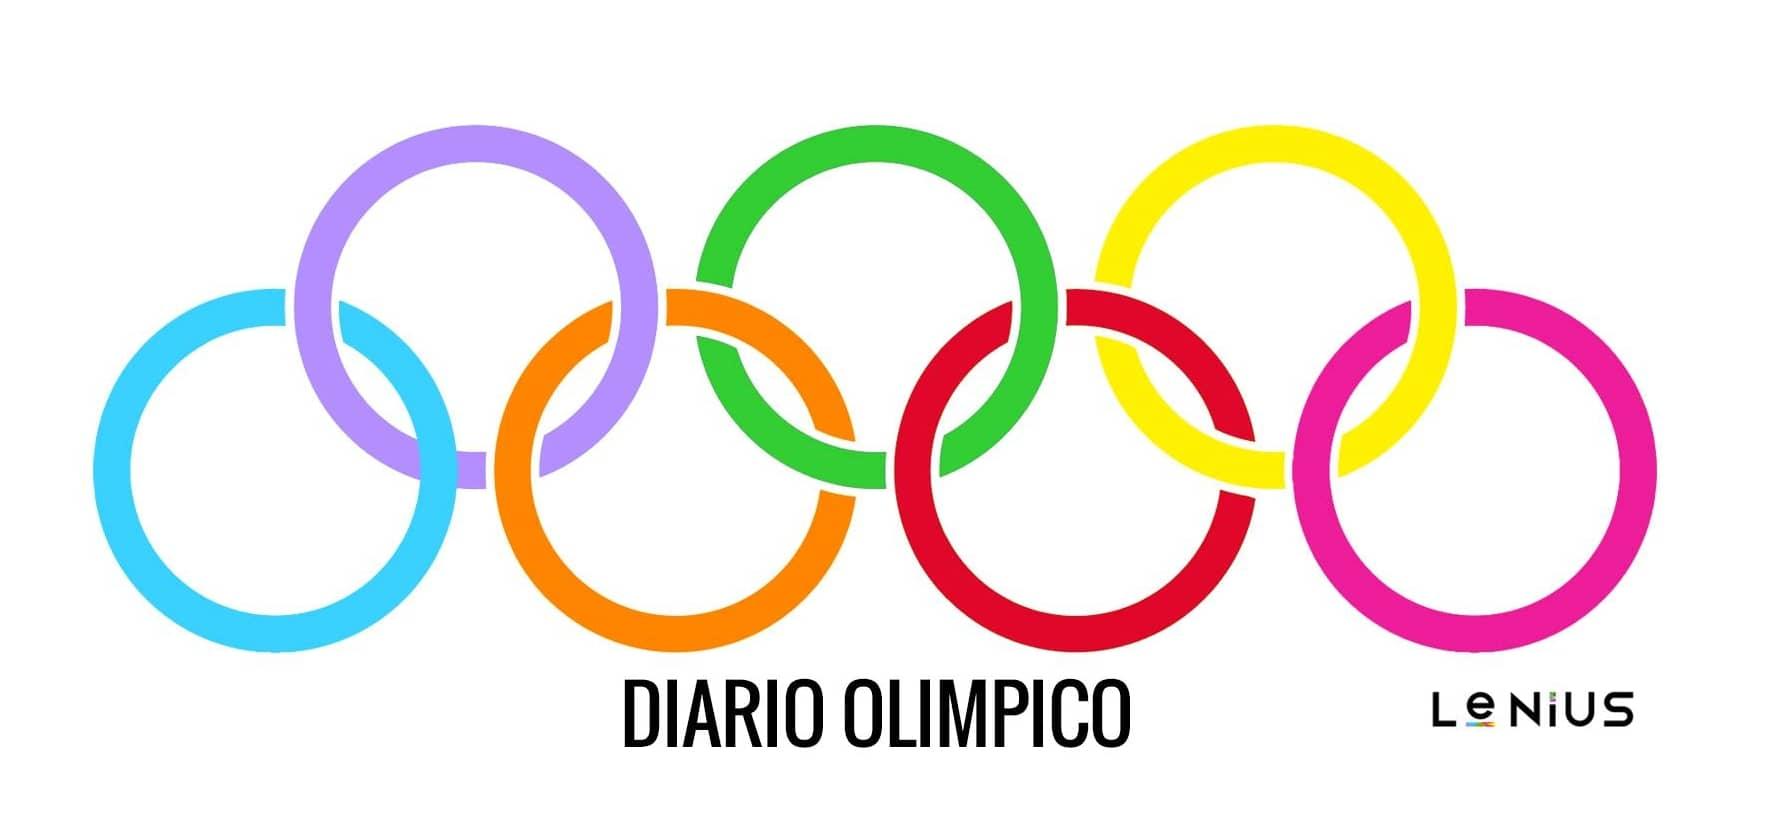 diario olimpico